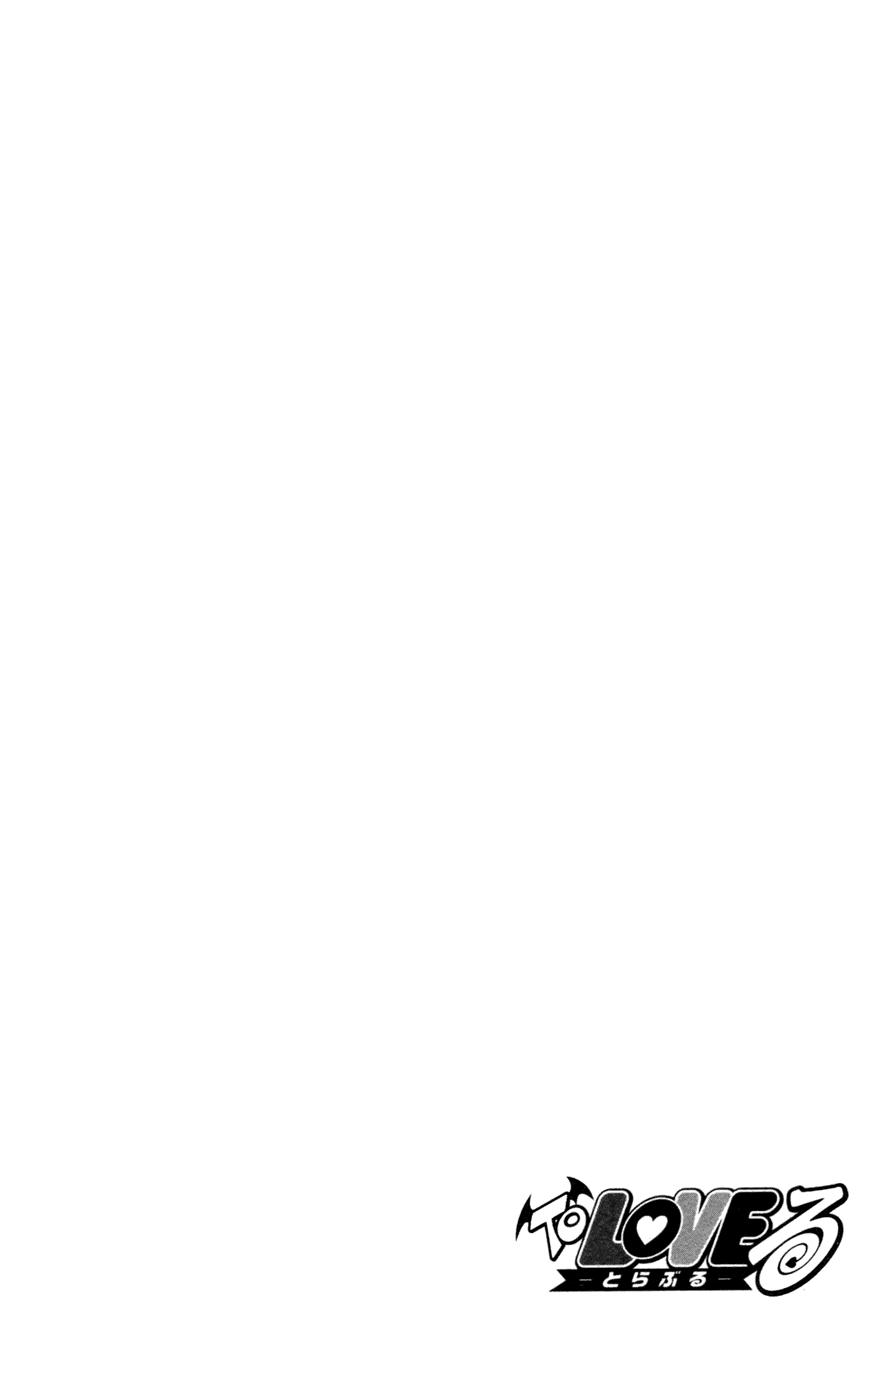 Манга Любовные неприятности / To Love-Ru  - Том 15 Глава 132 Страница 20